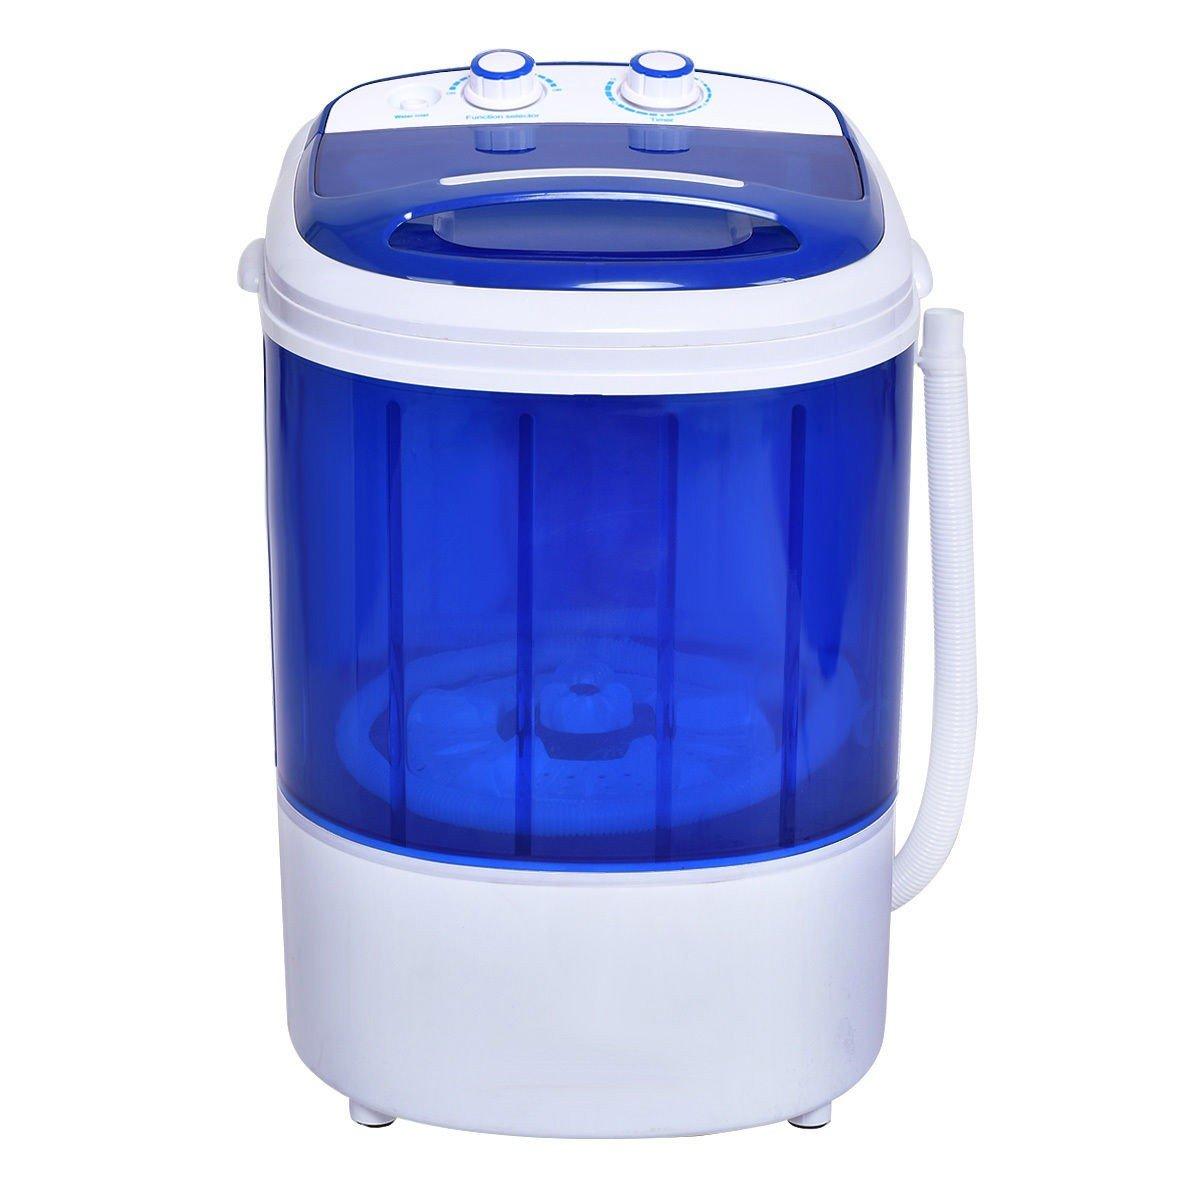 Mini Portable Small Washing Machine Laundry Clothes Washer Spin Dryer Unit Set